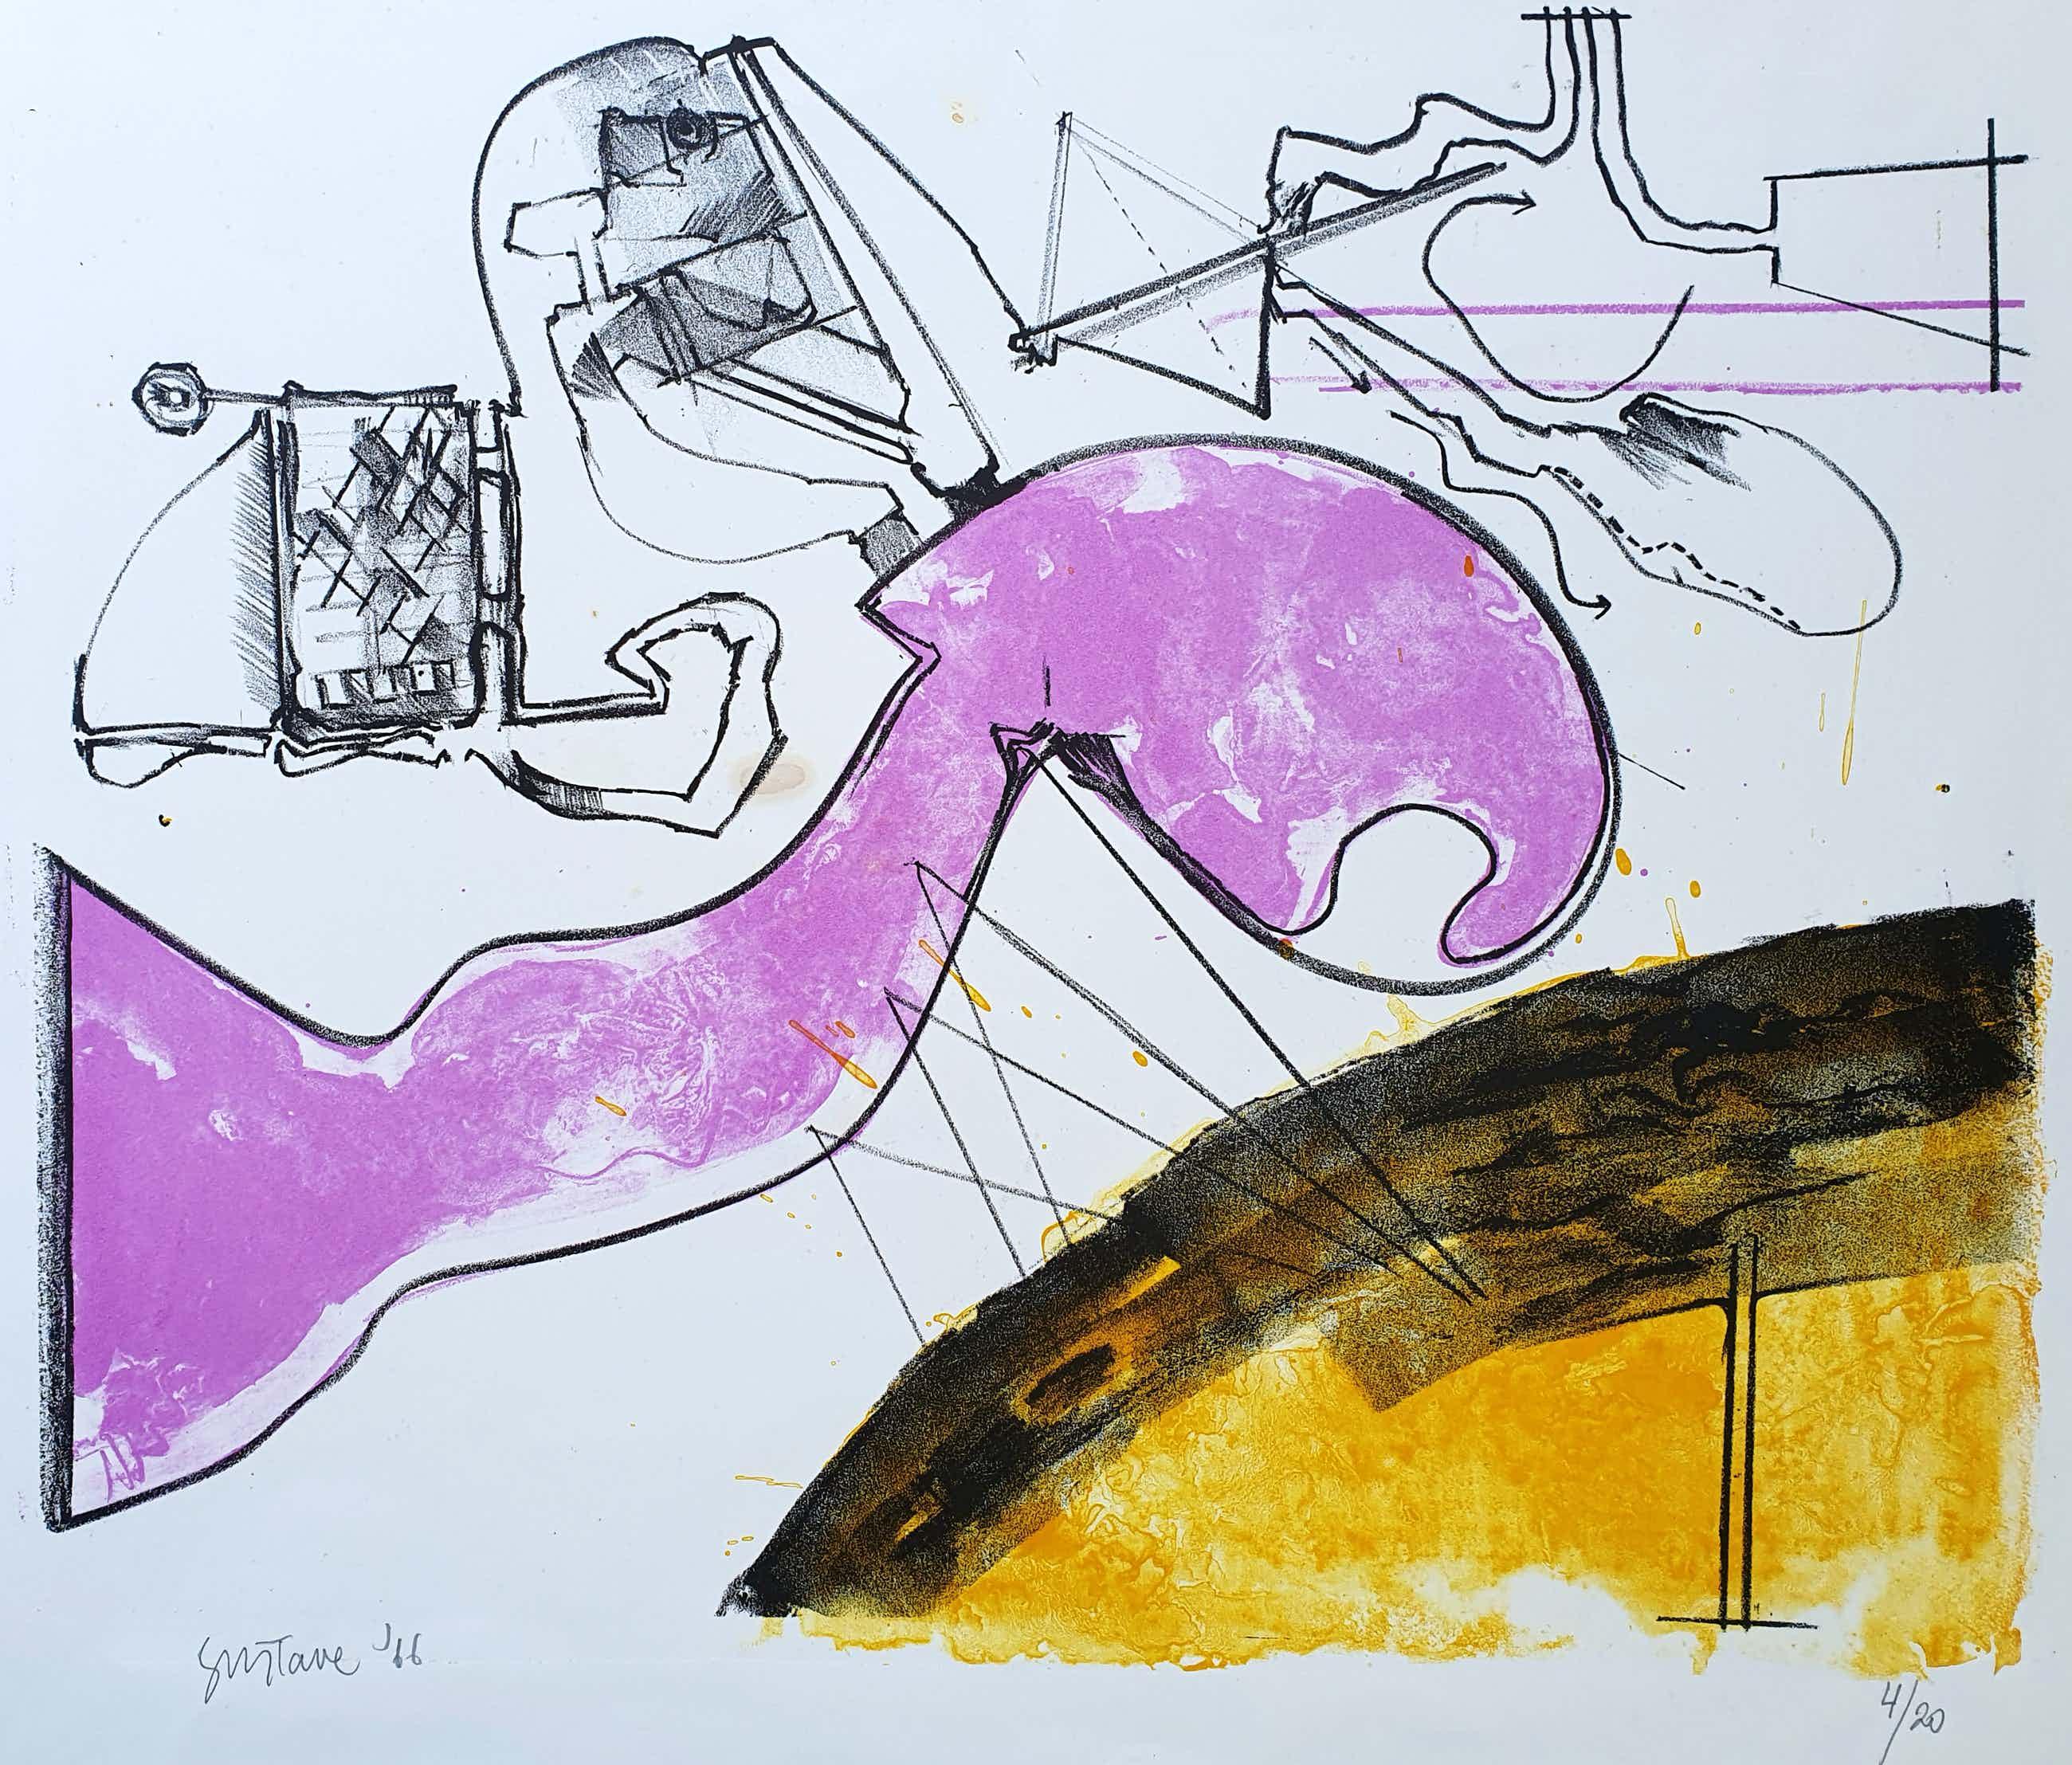 Gustave Asselbergs - Litho, Compositie in paars en geel(1966) kopen? Bied vanaf 45!